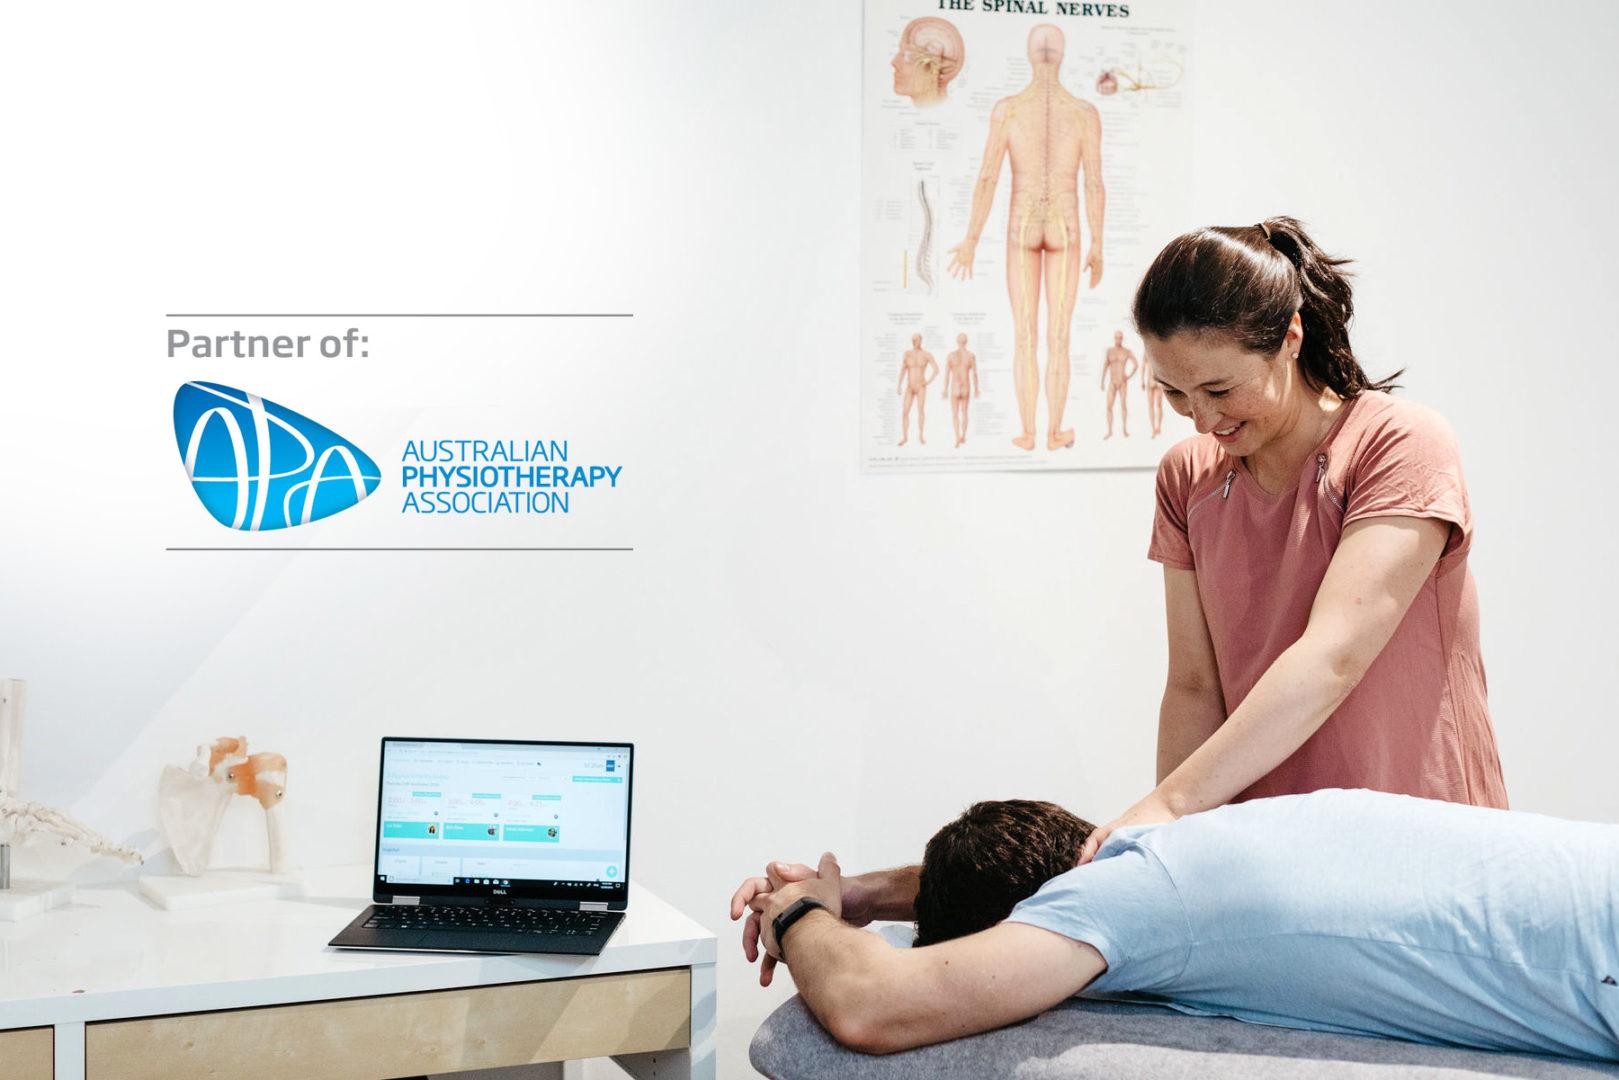 Better Clinics_Reckon_Partner Australian Physiotherapy Association